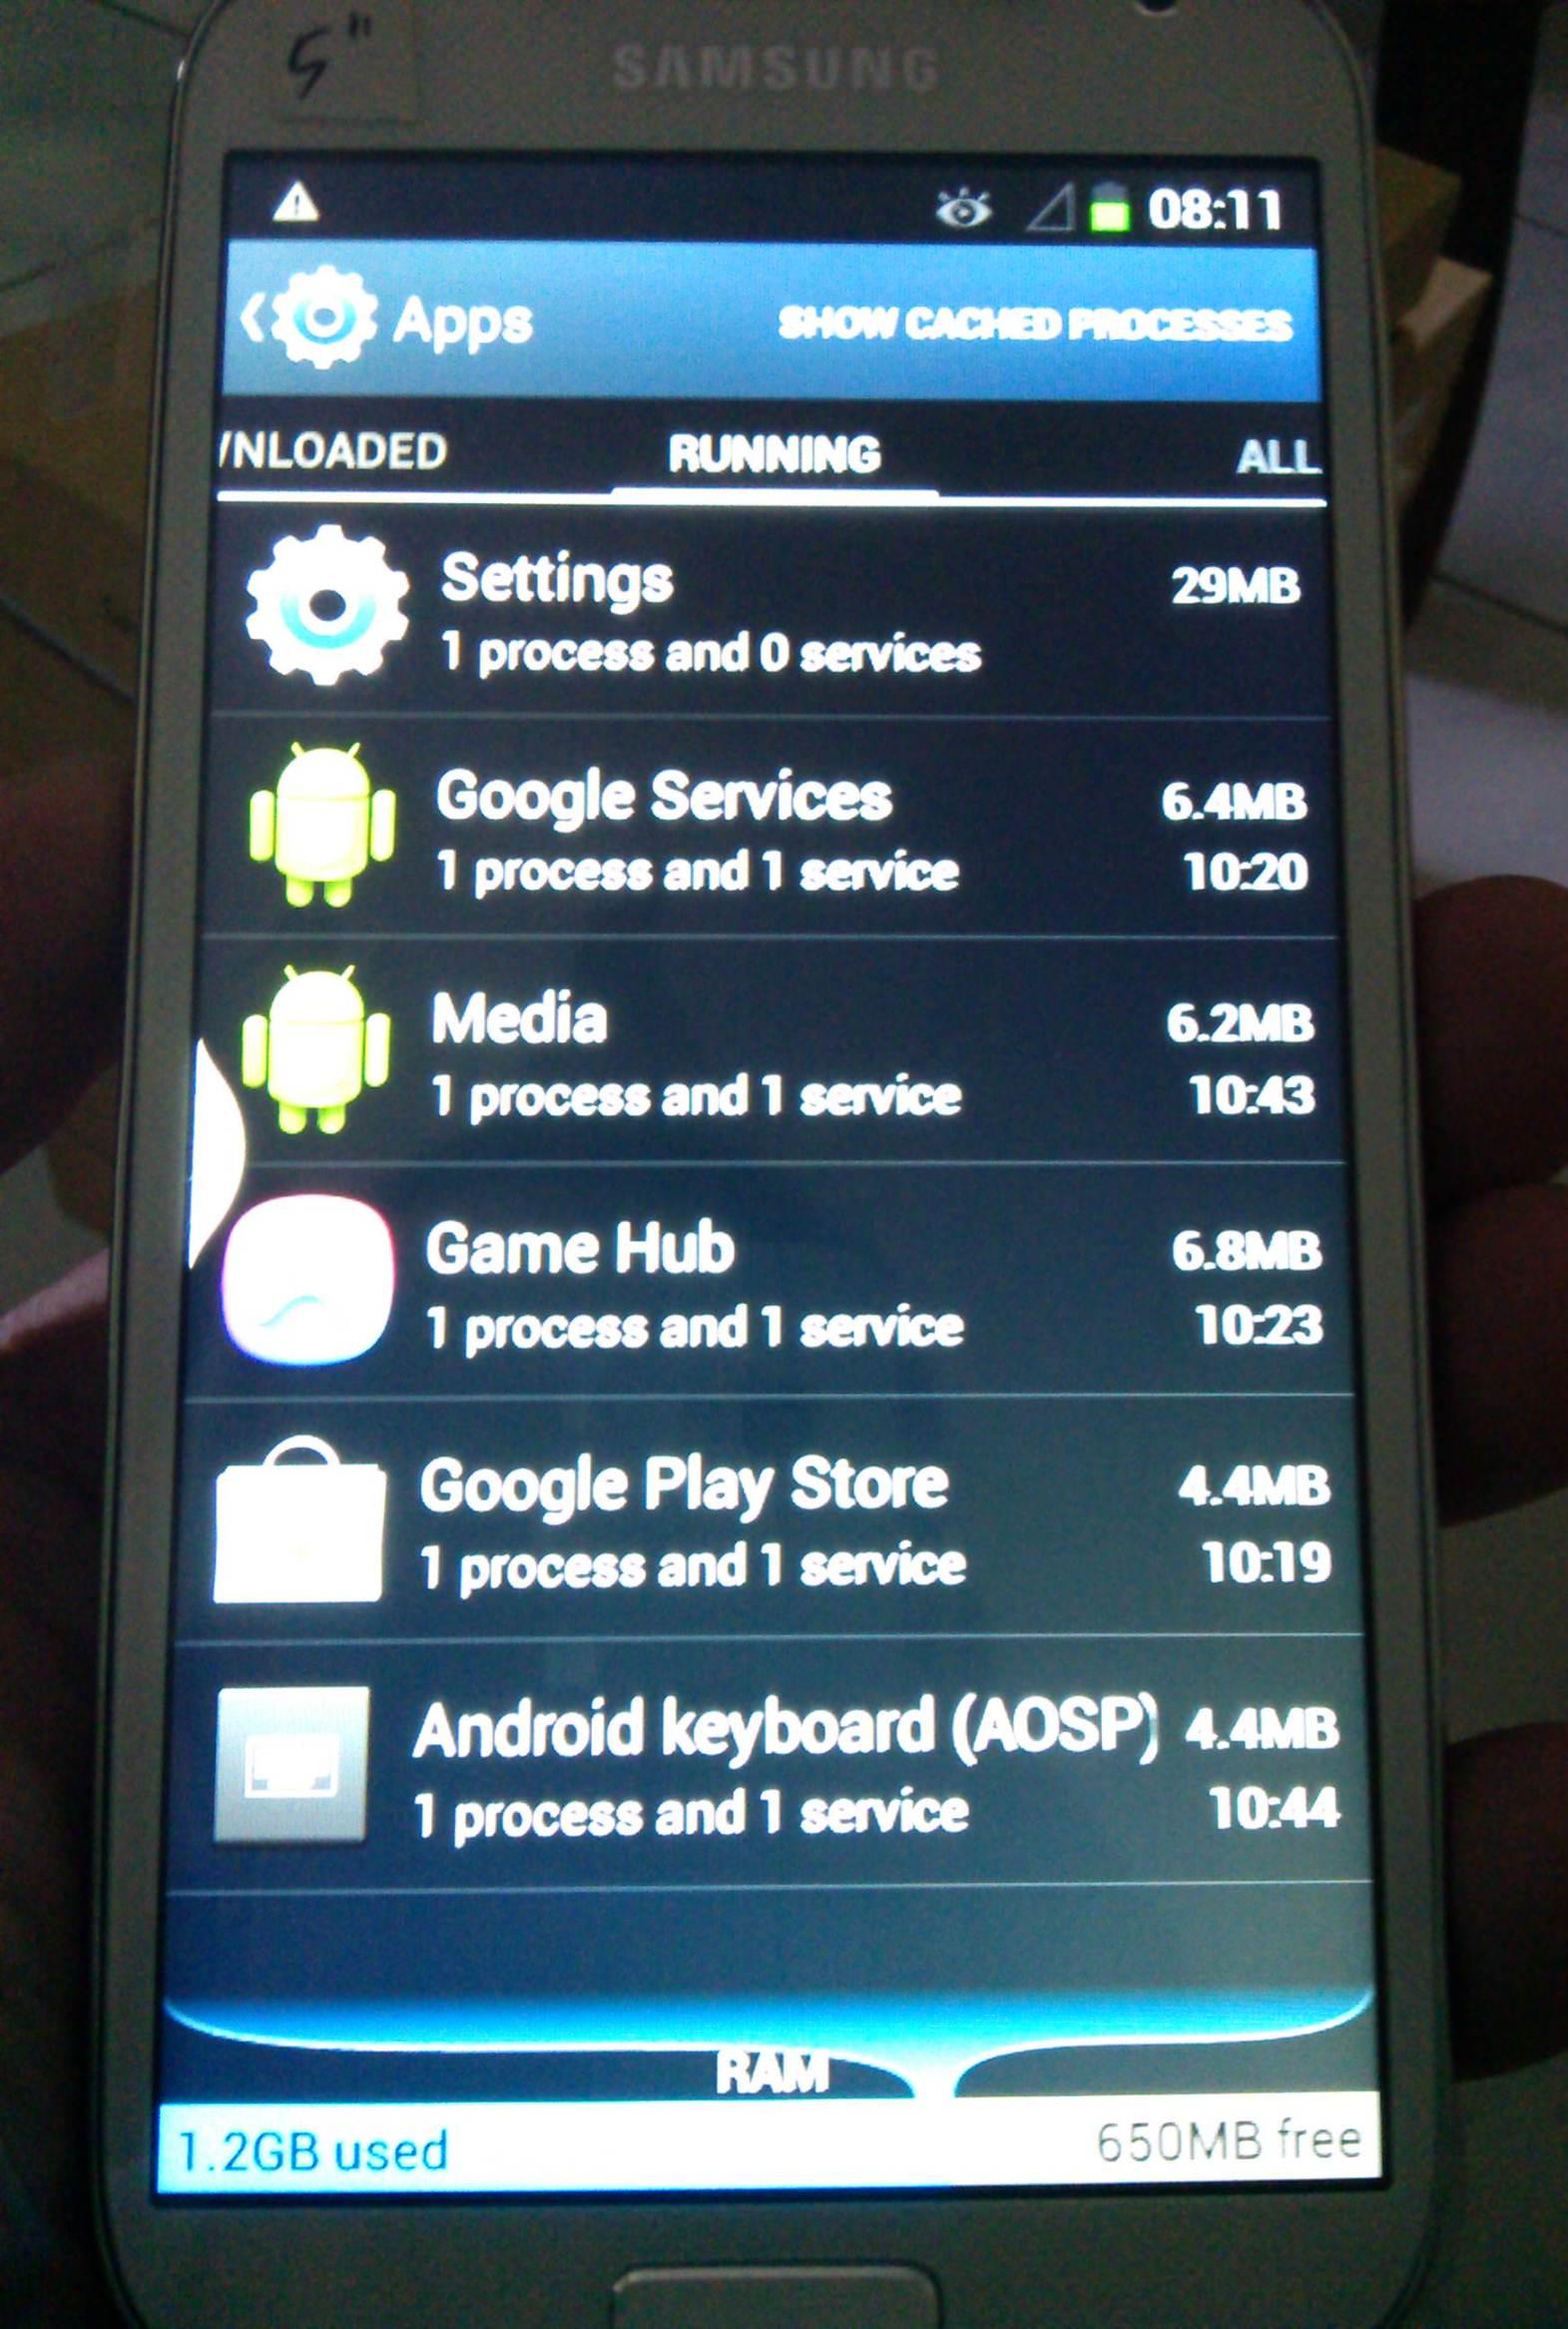 Supercopy Samsung S4 5 inch